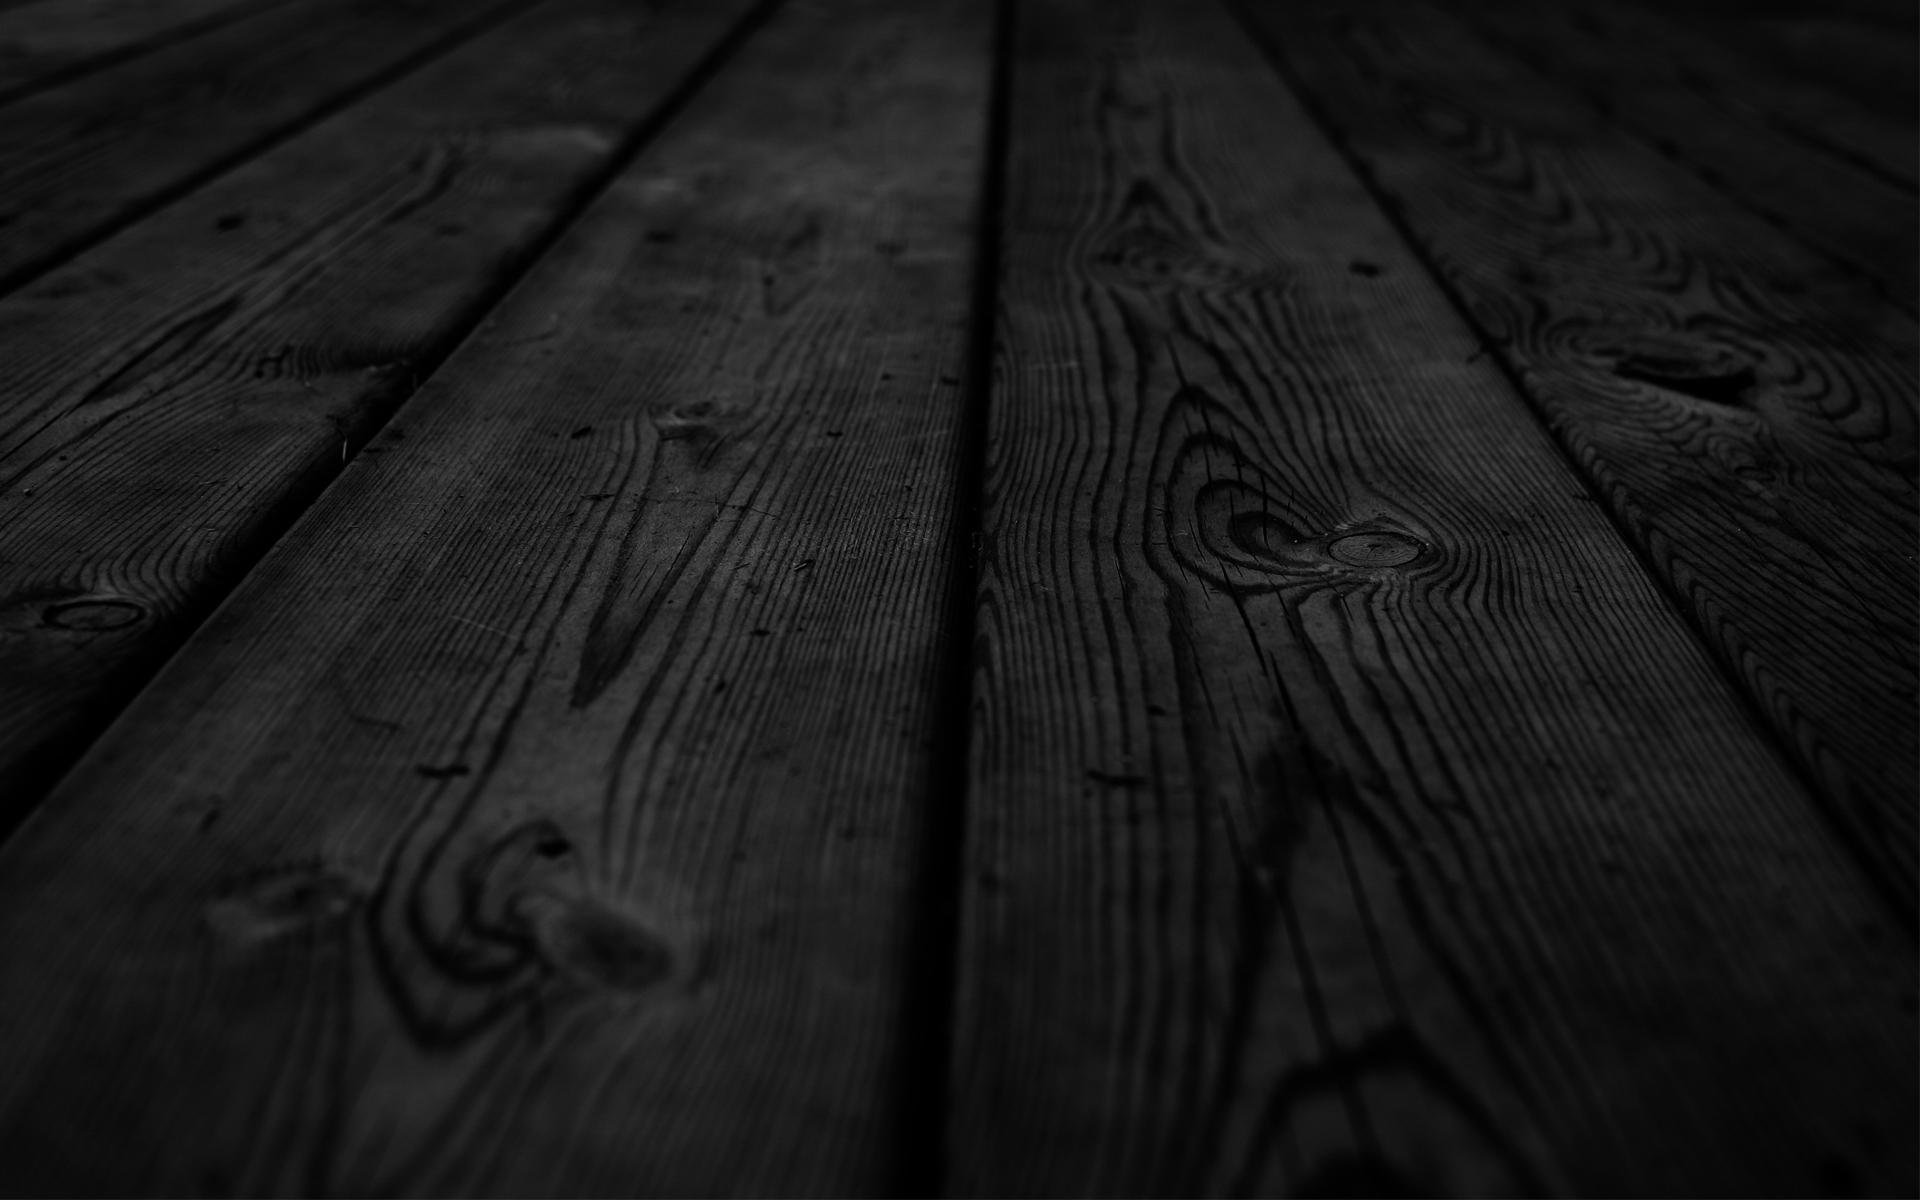 black-wood-floor-wallpaper-inspiration-5.jpg